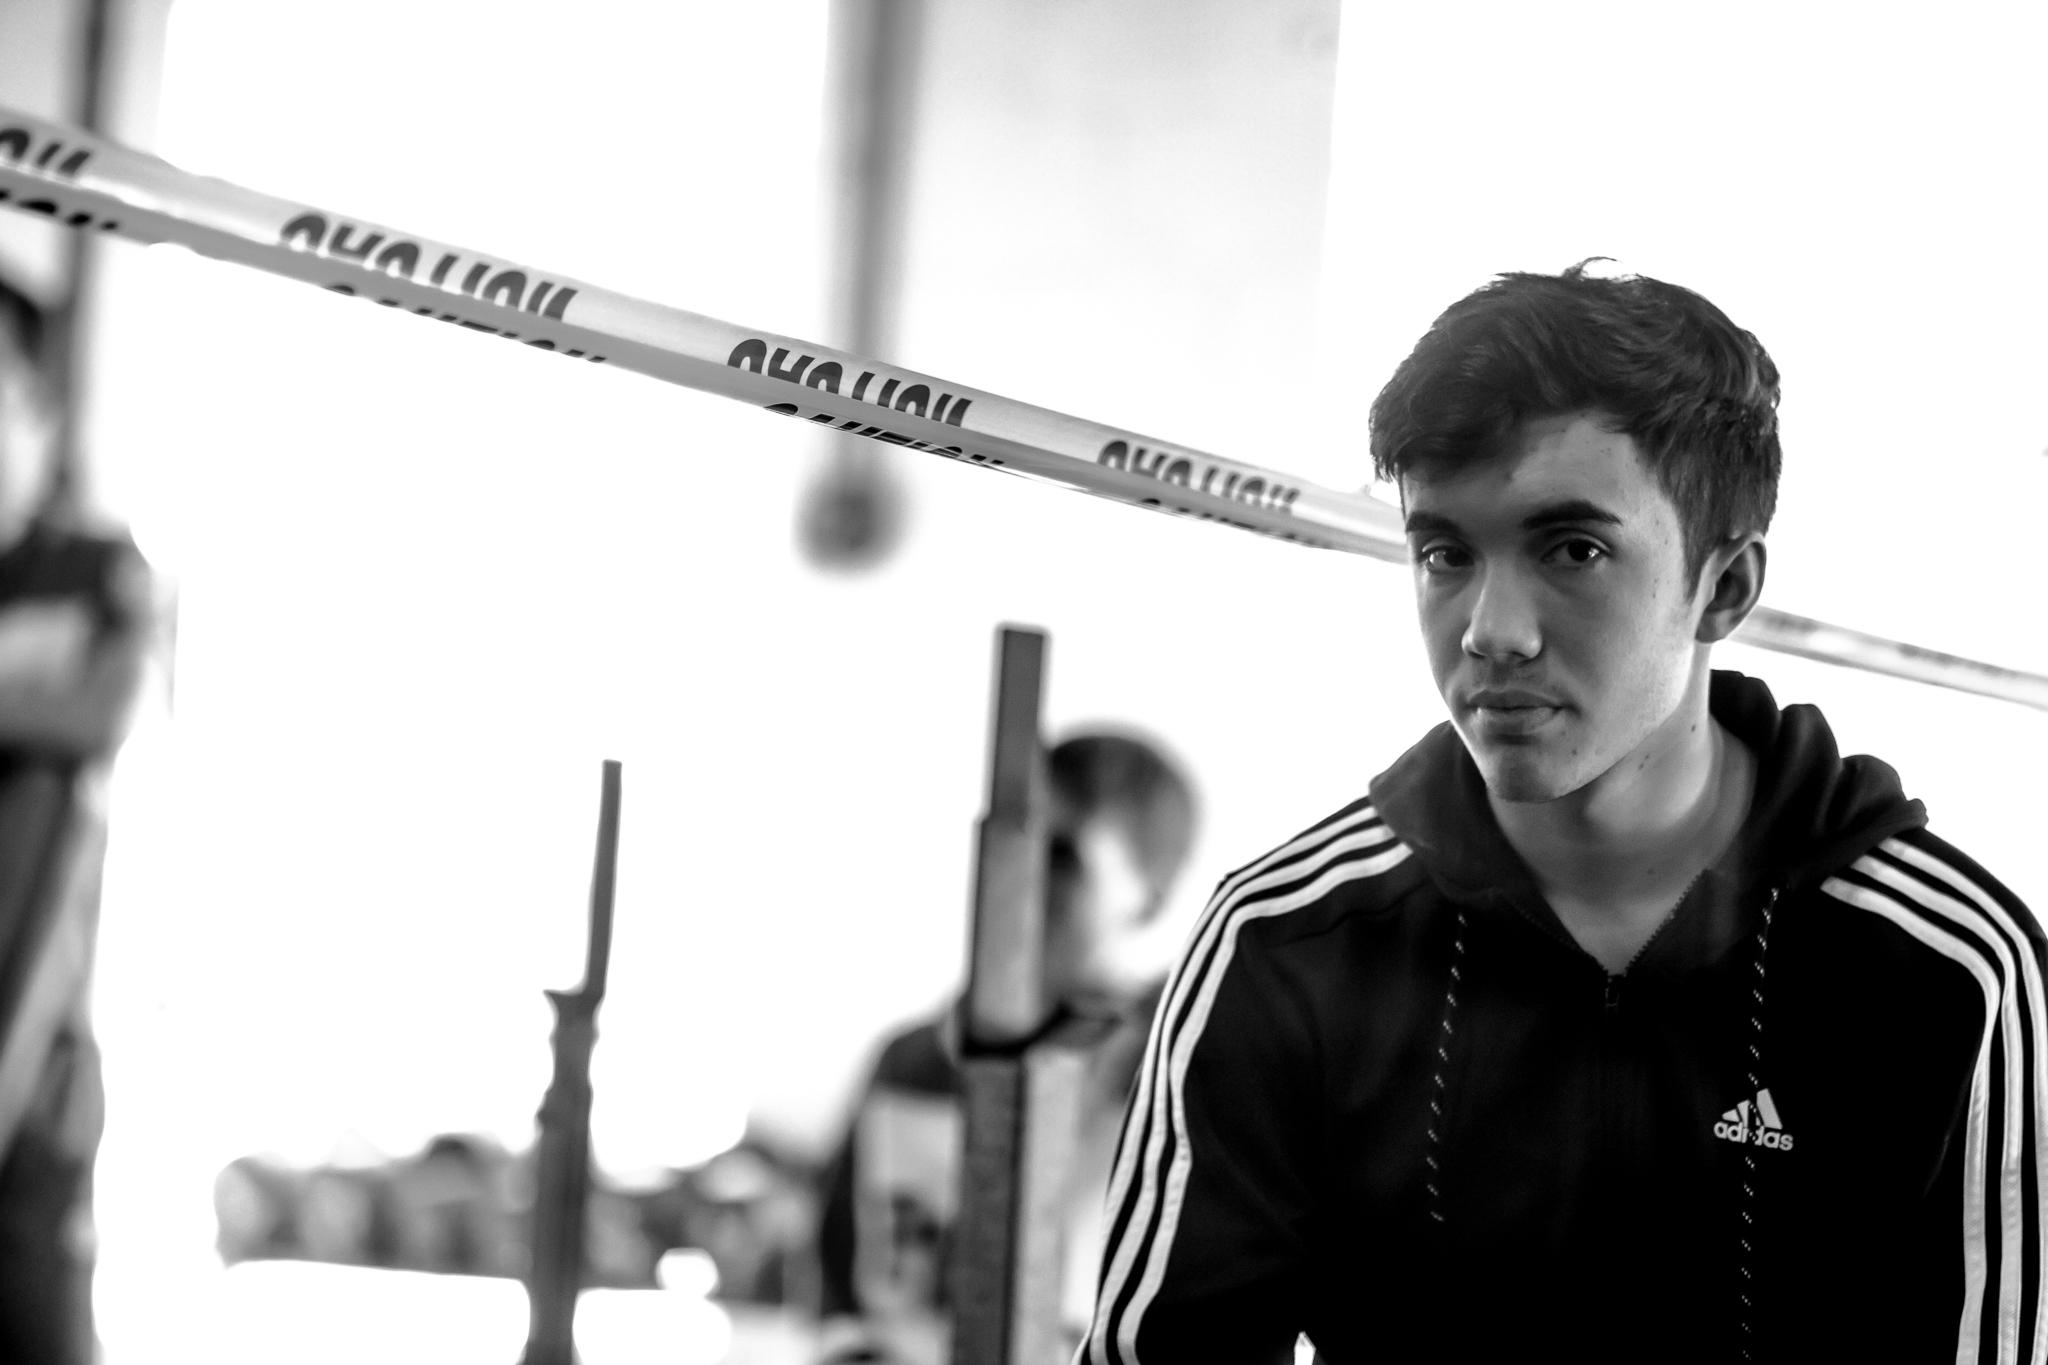 men-warwick-new-york-intrepid-strength-conditioning-winter-open-weightlifting-meet-weightlifting-photography (9 of 24).jpg